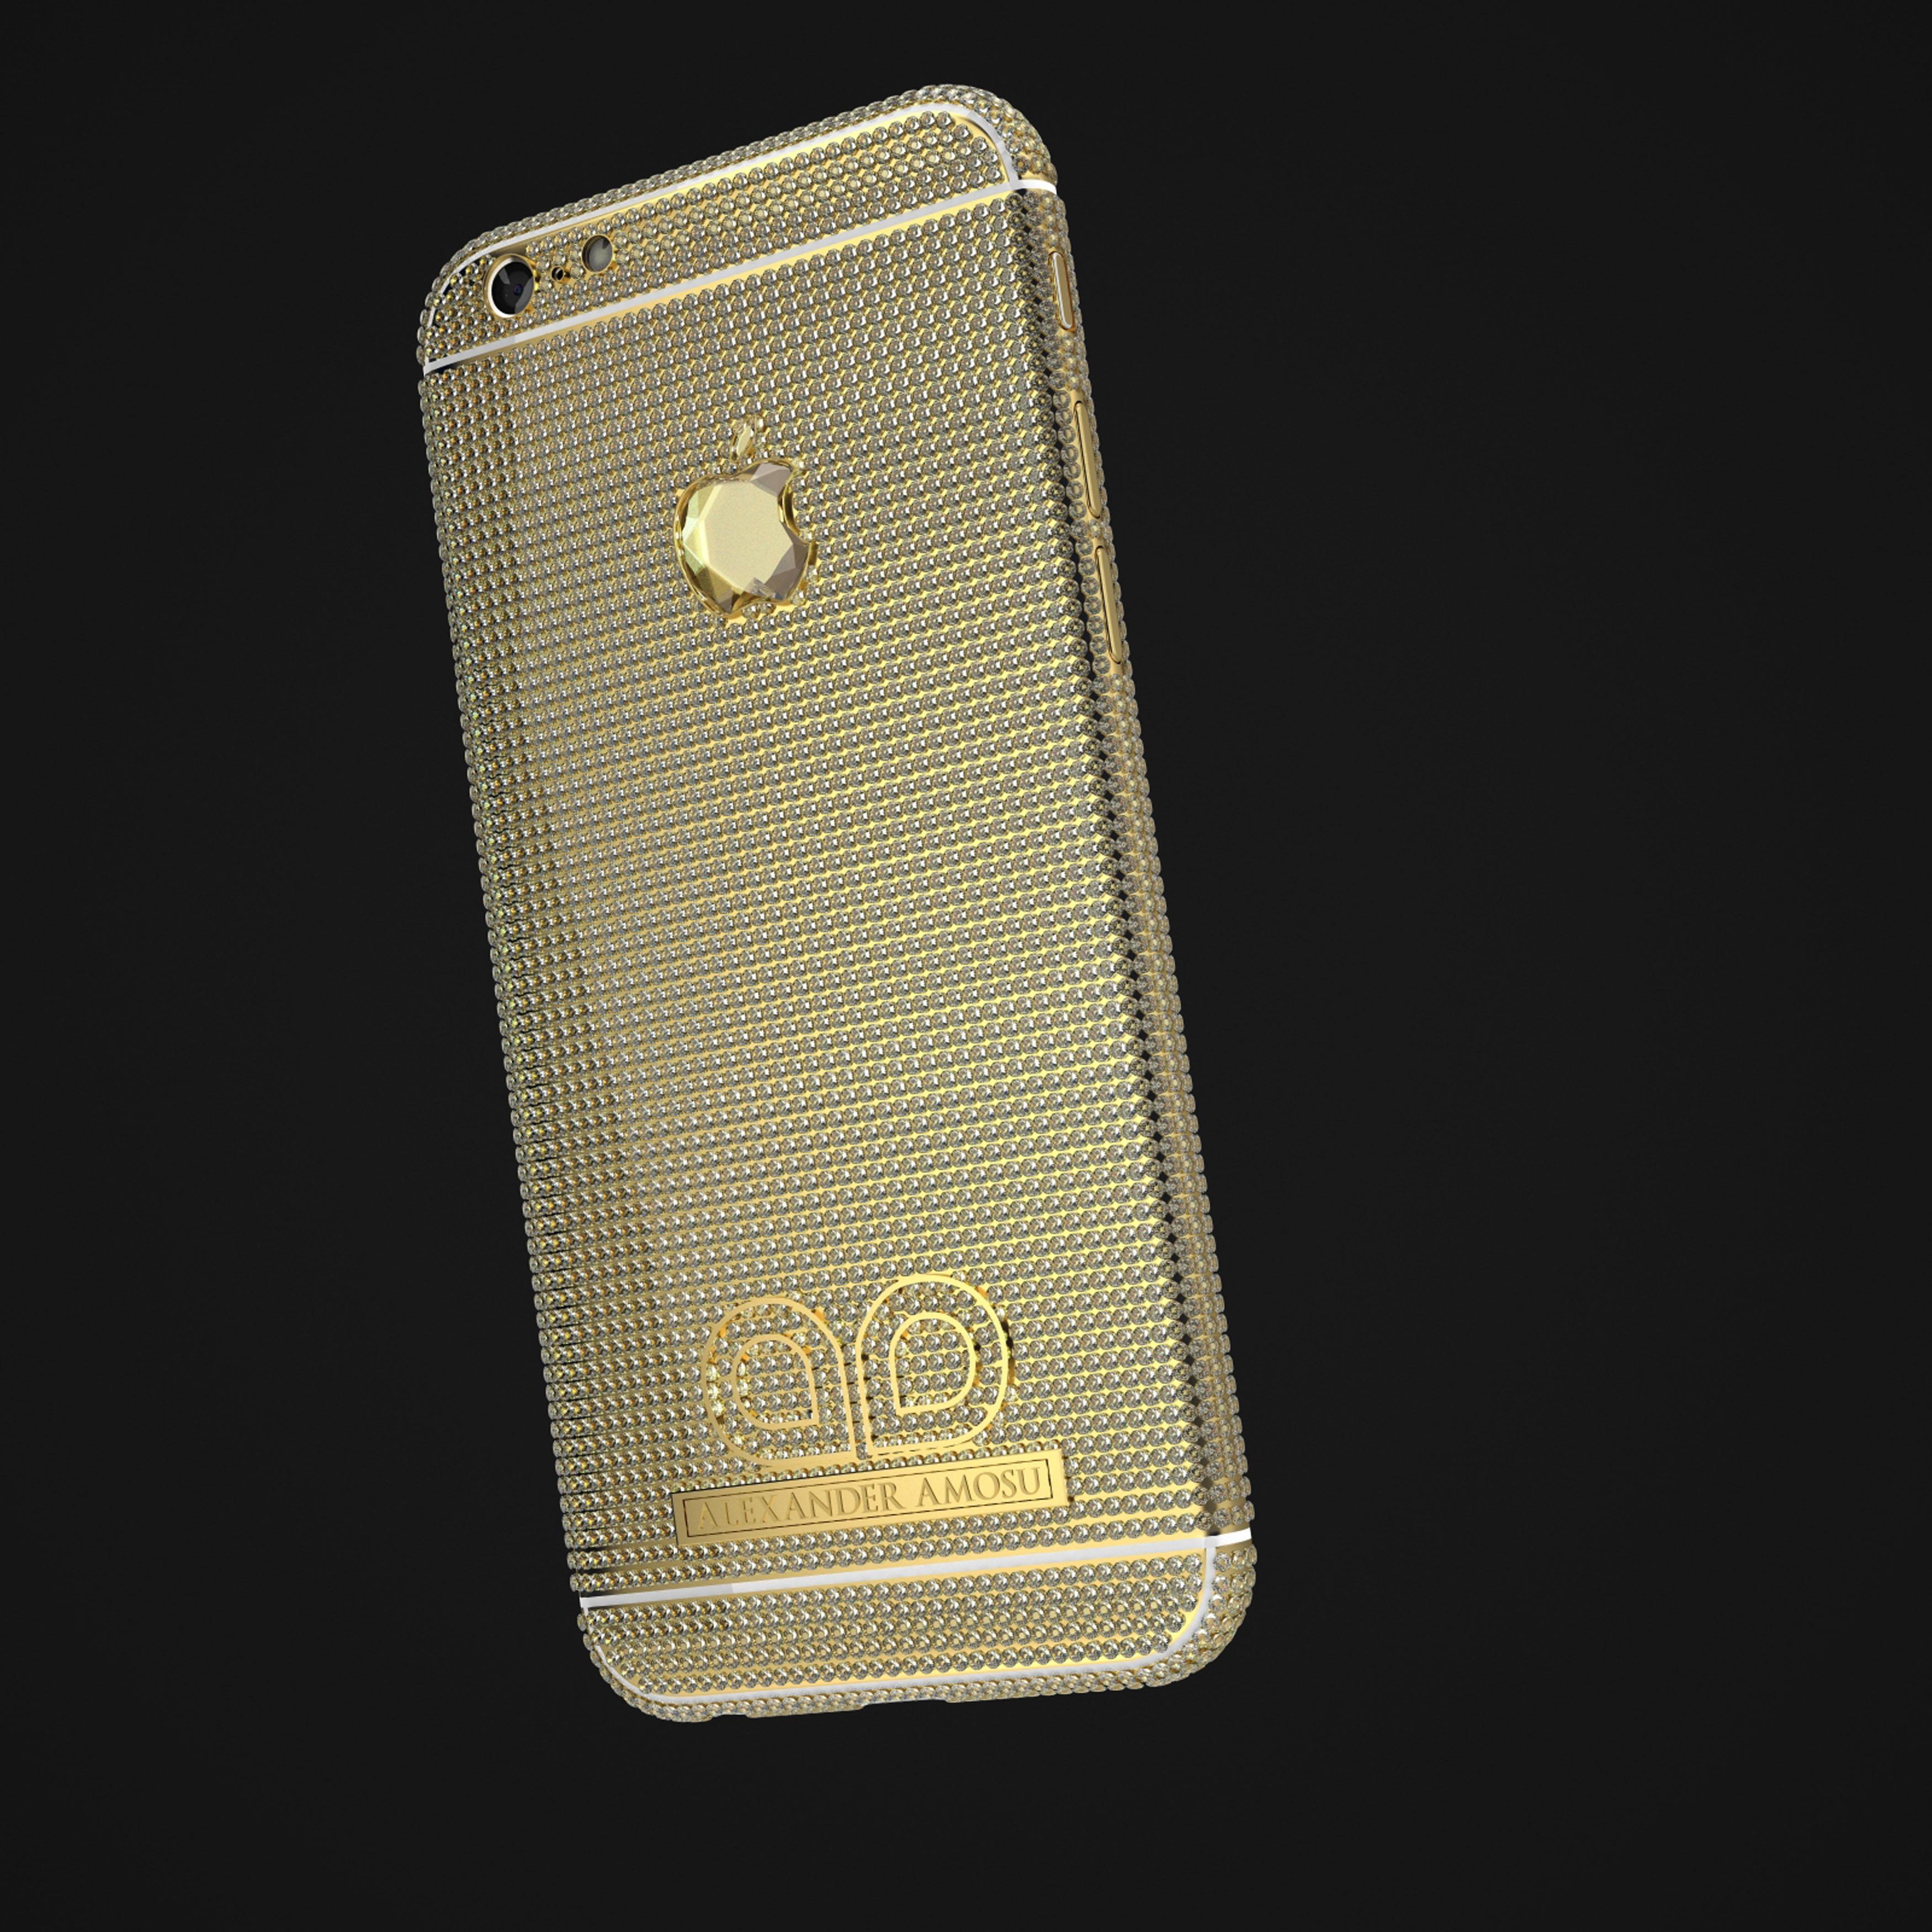 1.7 Million Pound iPhone 6